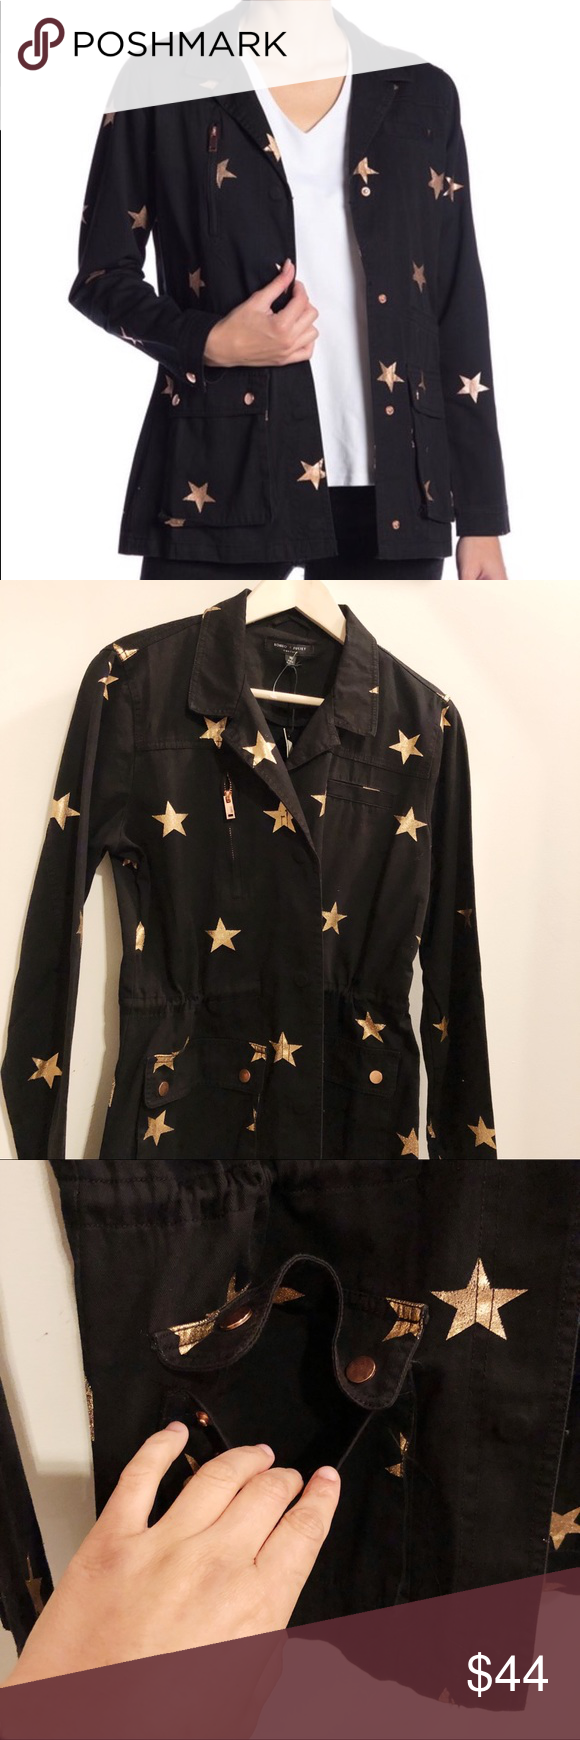 8c464e415b Romeo   Juliet Contour Military Jacket Black Romeo   Juliet Contour Military  Jacket Black Gold star